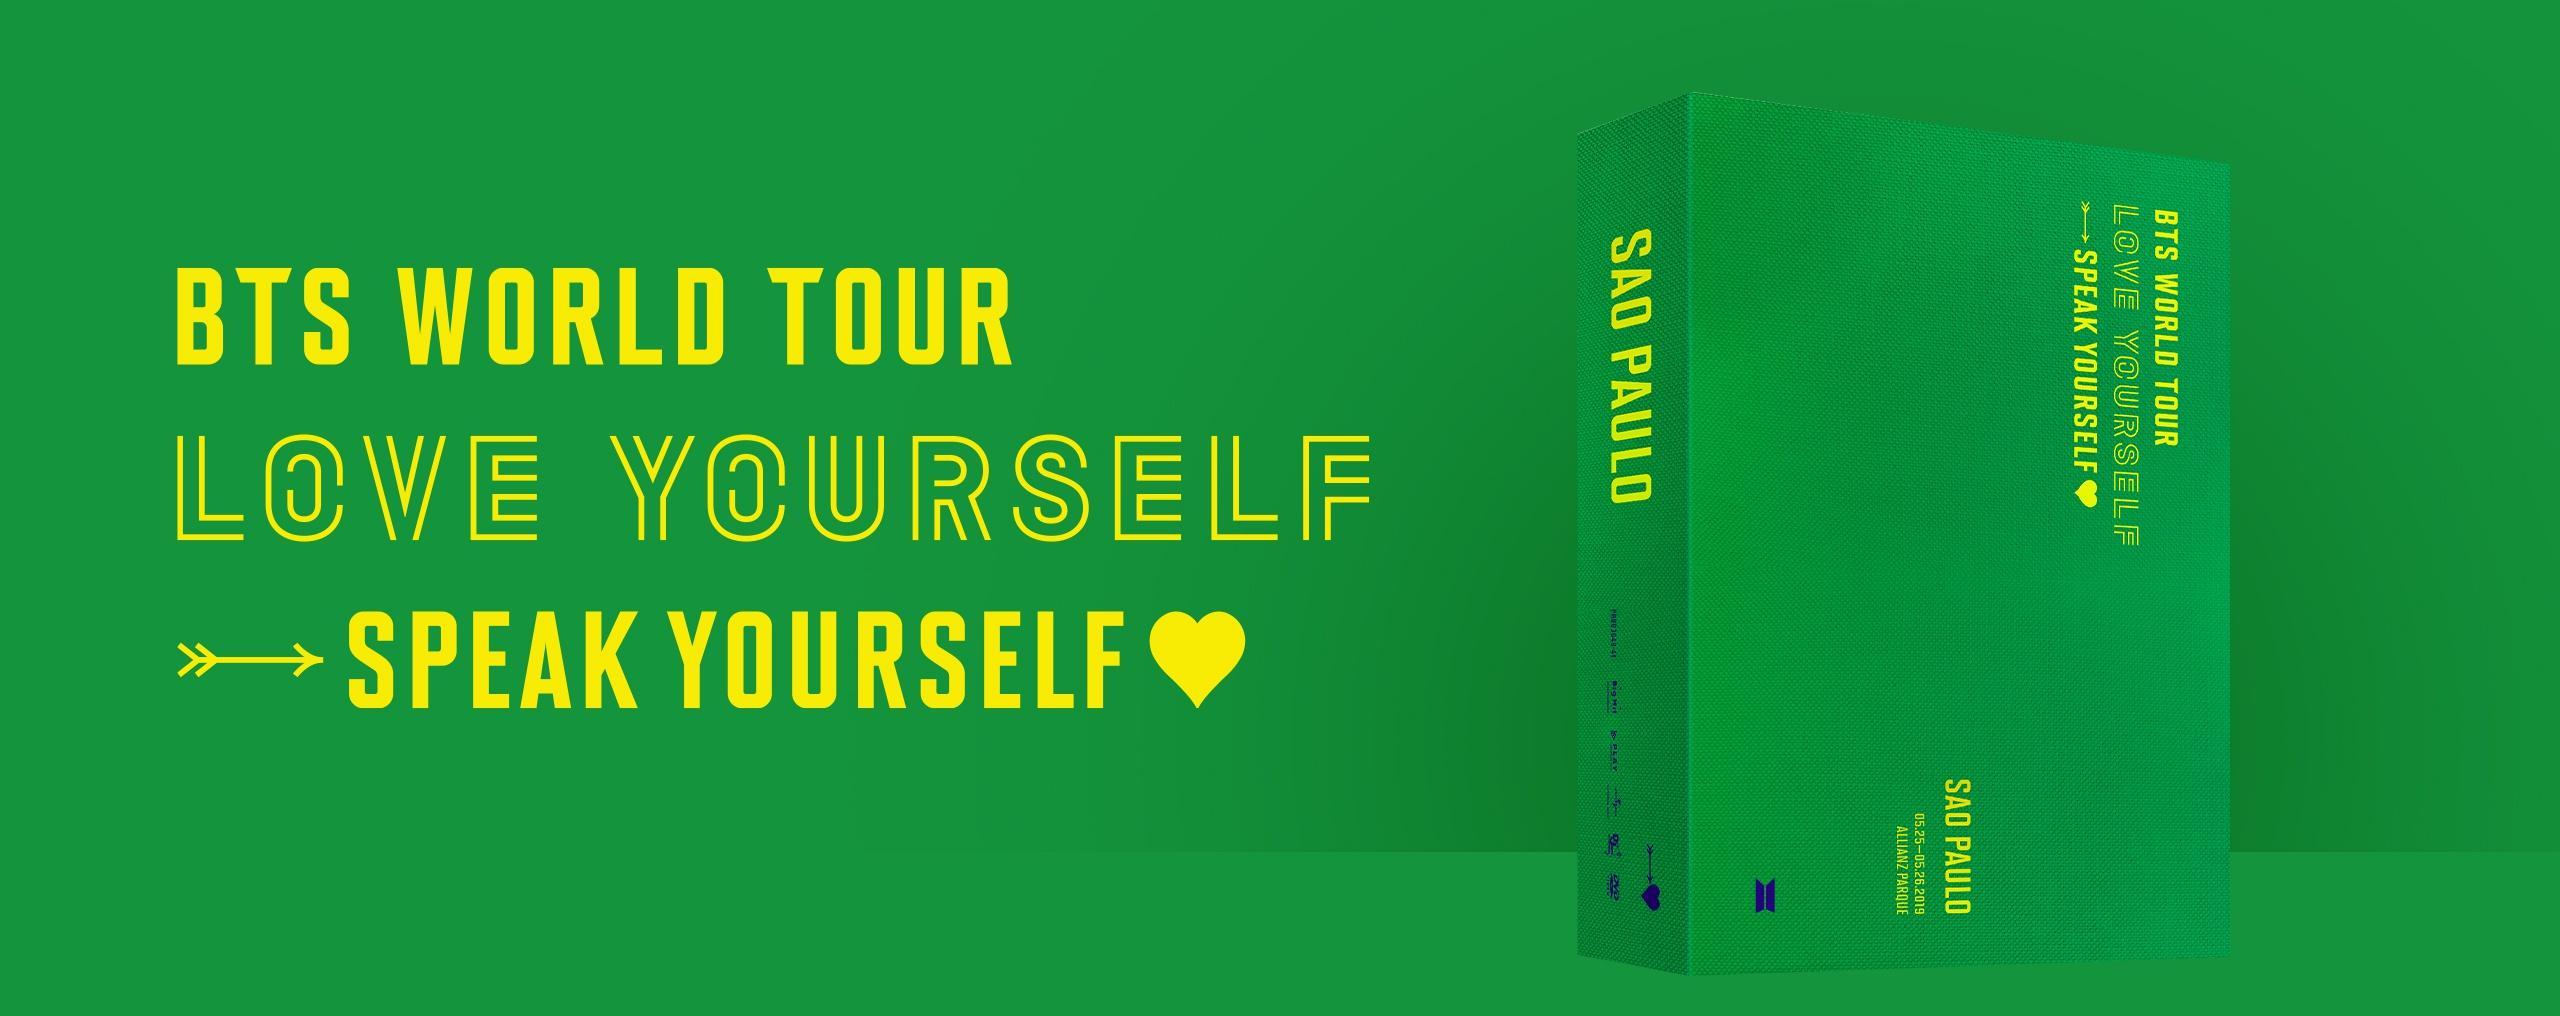 DVD「BTS WORLD TOUR 'LOVE YOURSELF: SPEAK YOURSELF' SAO PAULO」